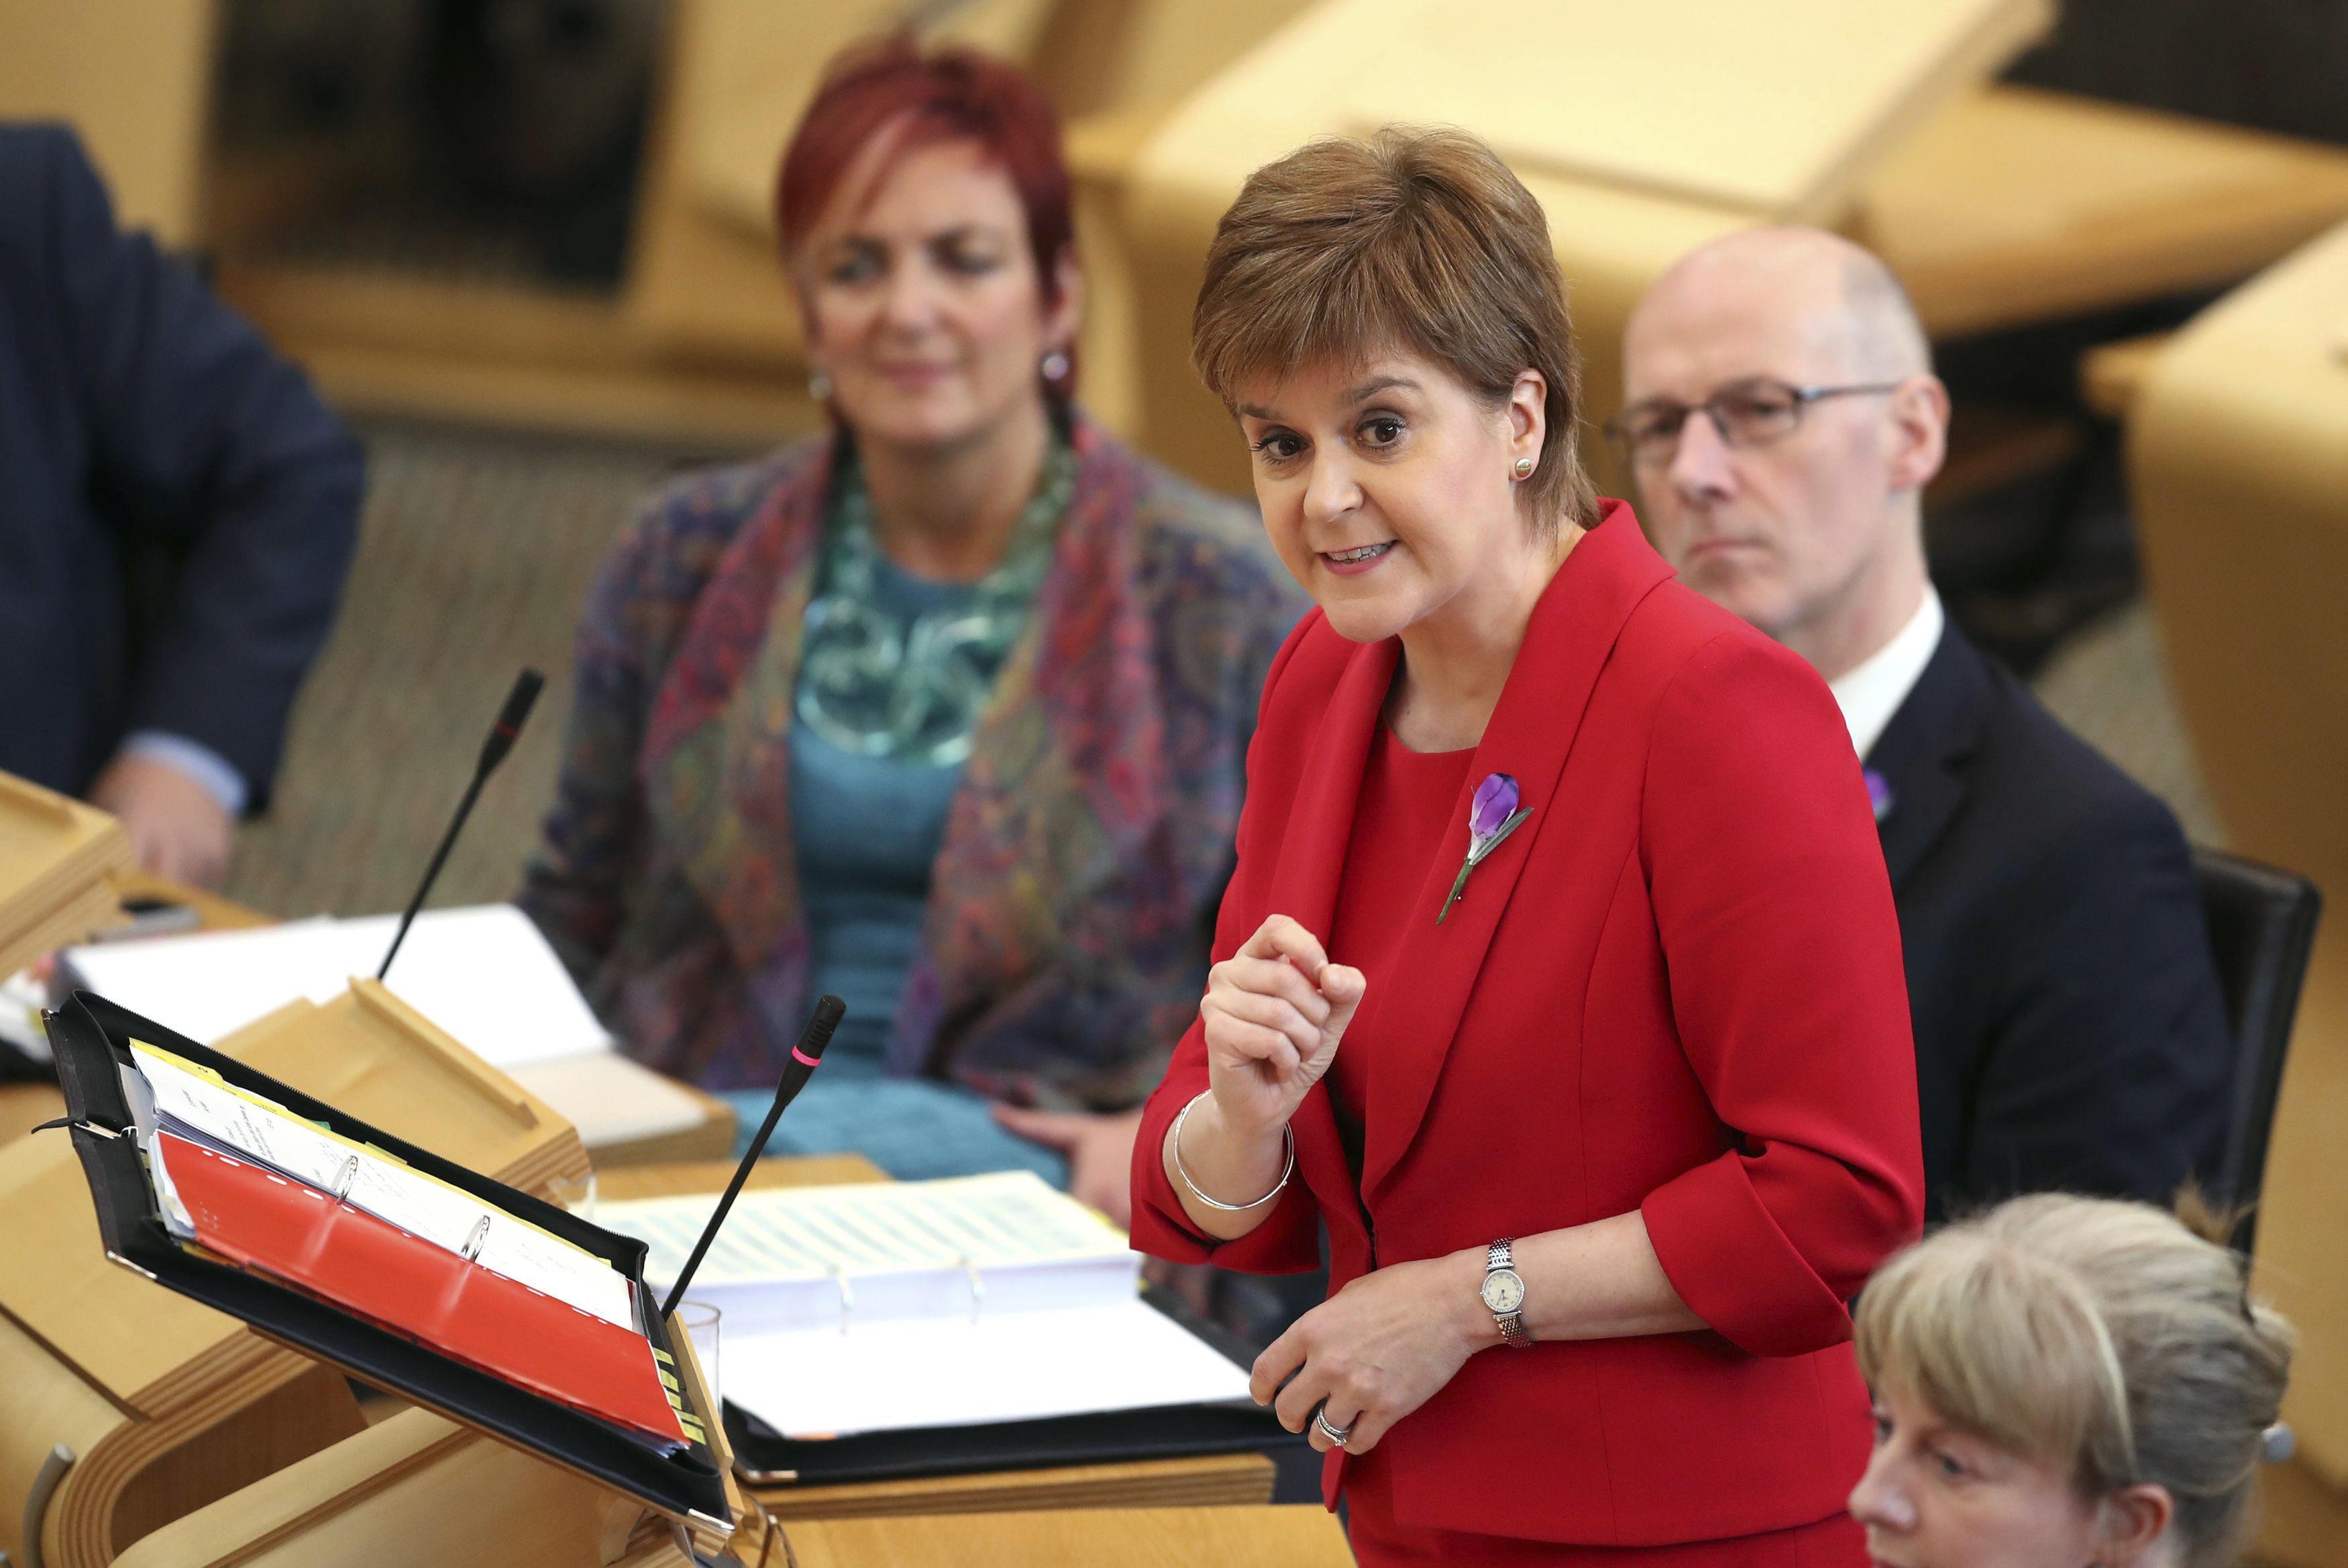 Scotland may automatically pardon men previously convicted of consensual homosexual sex: Report